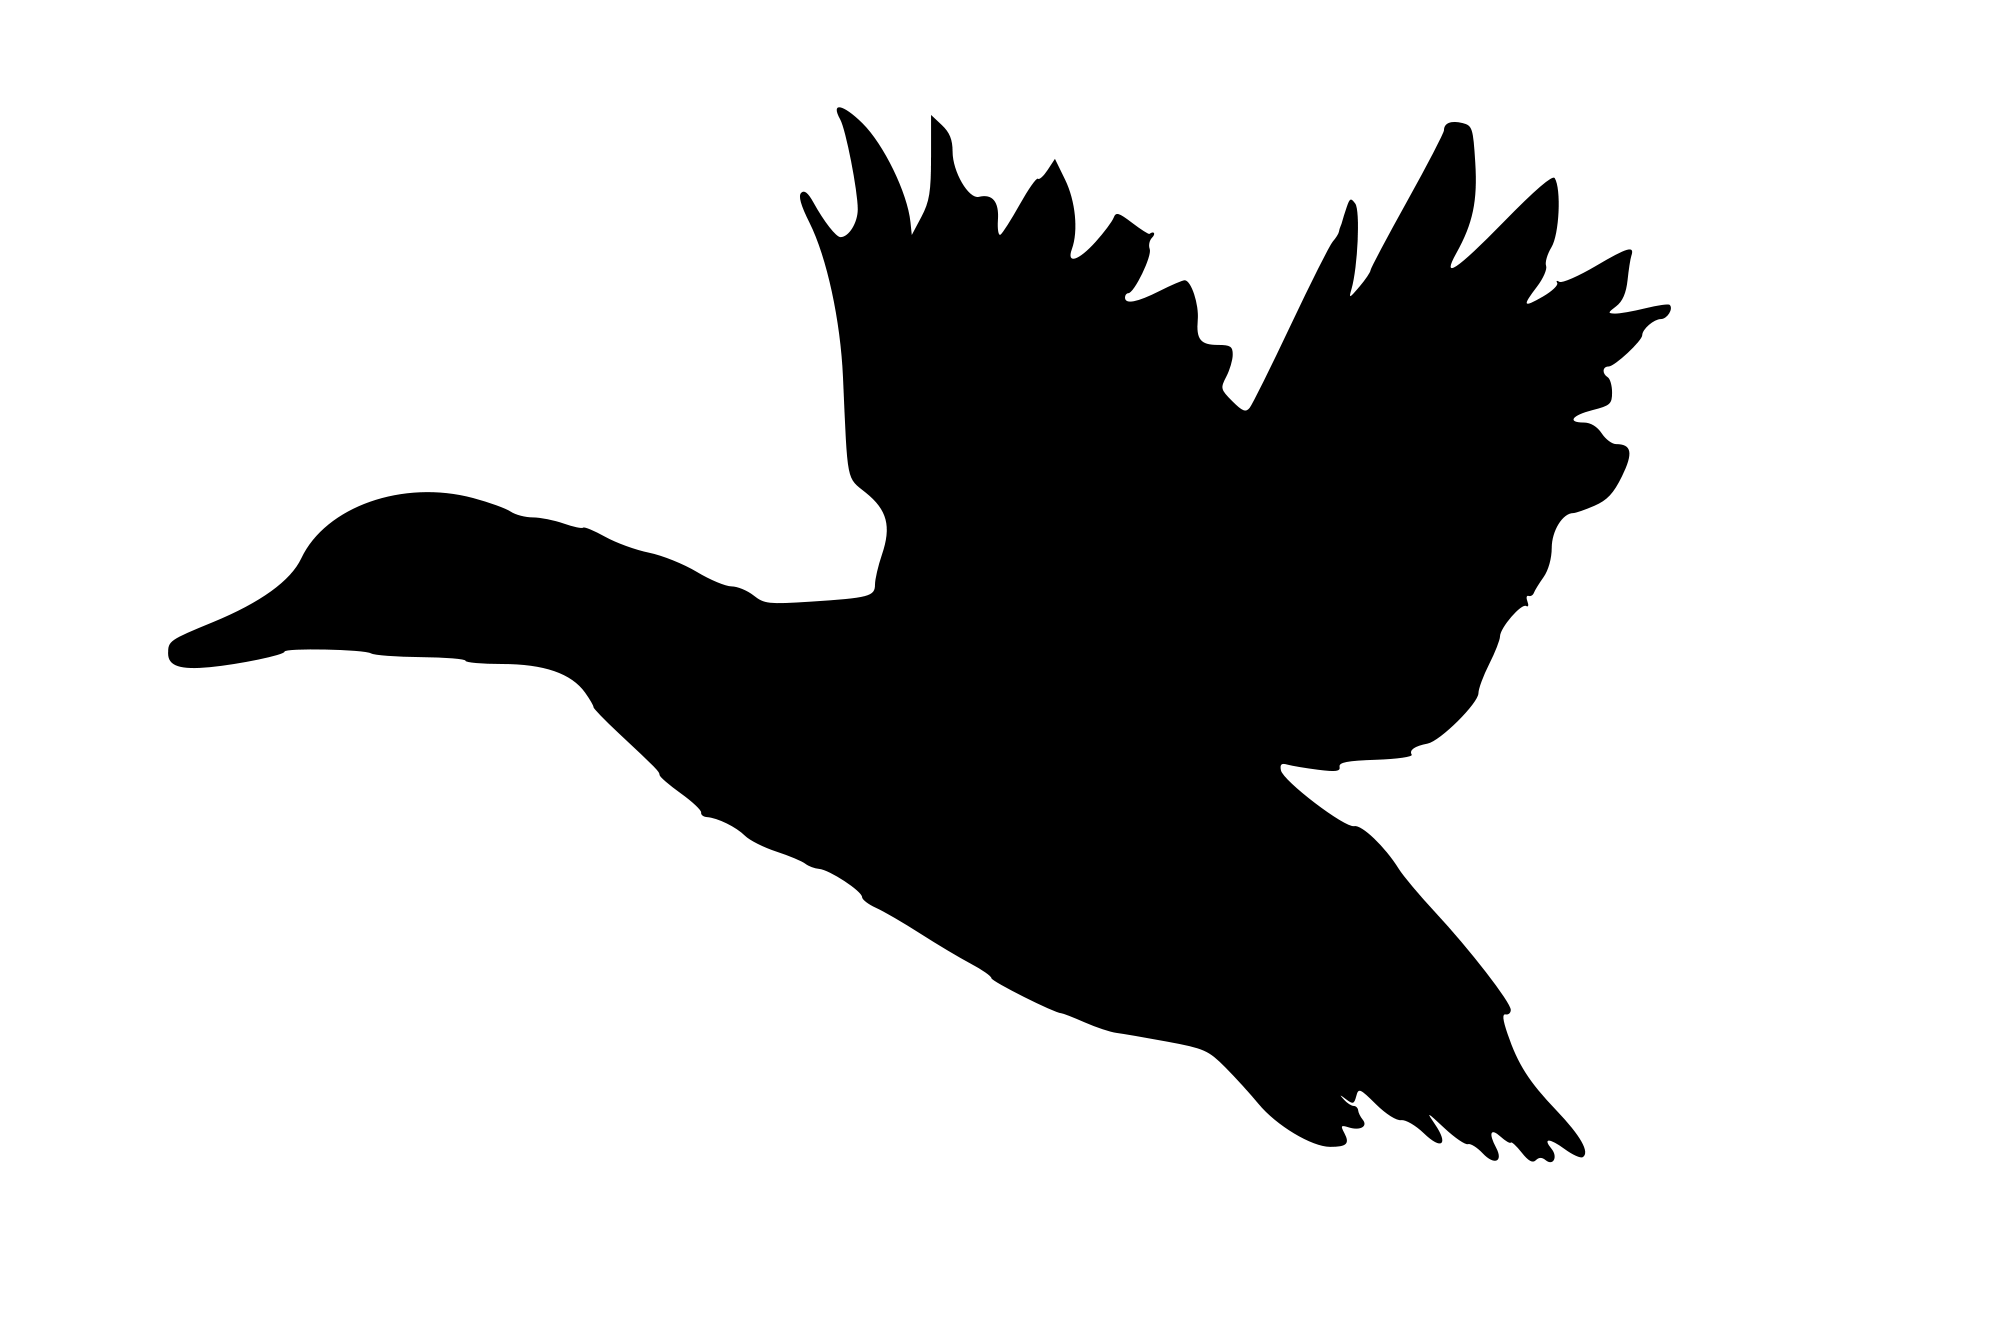 free download Duck Landing Silhouette at GetDrawings